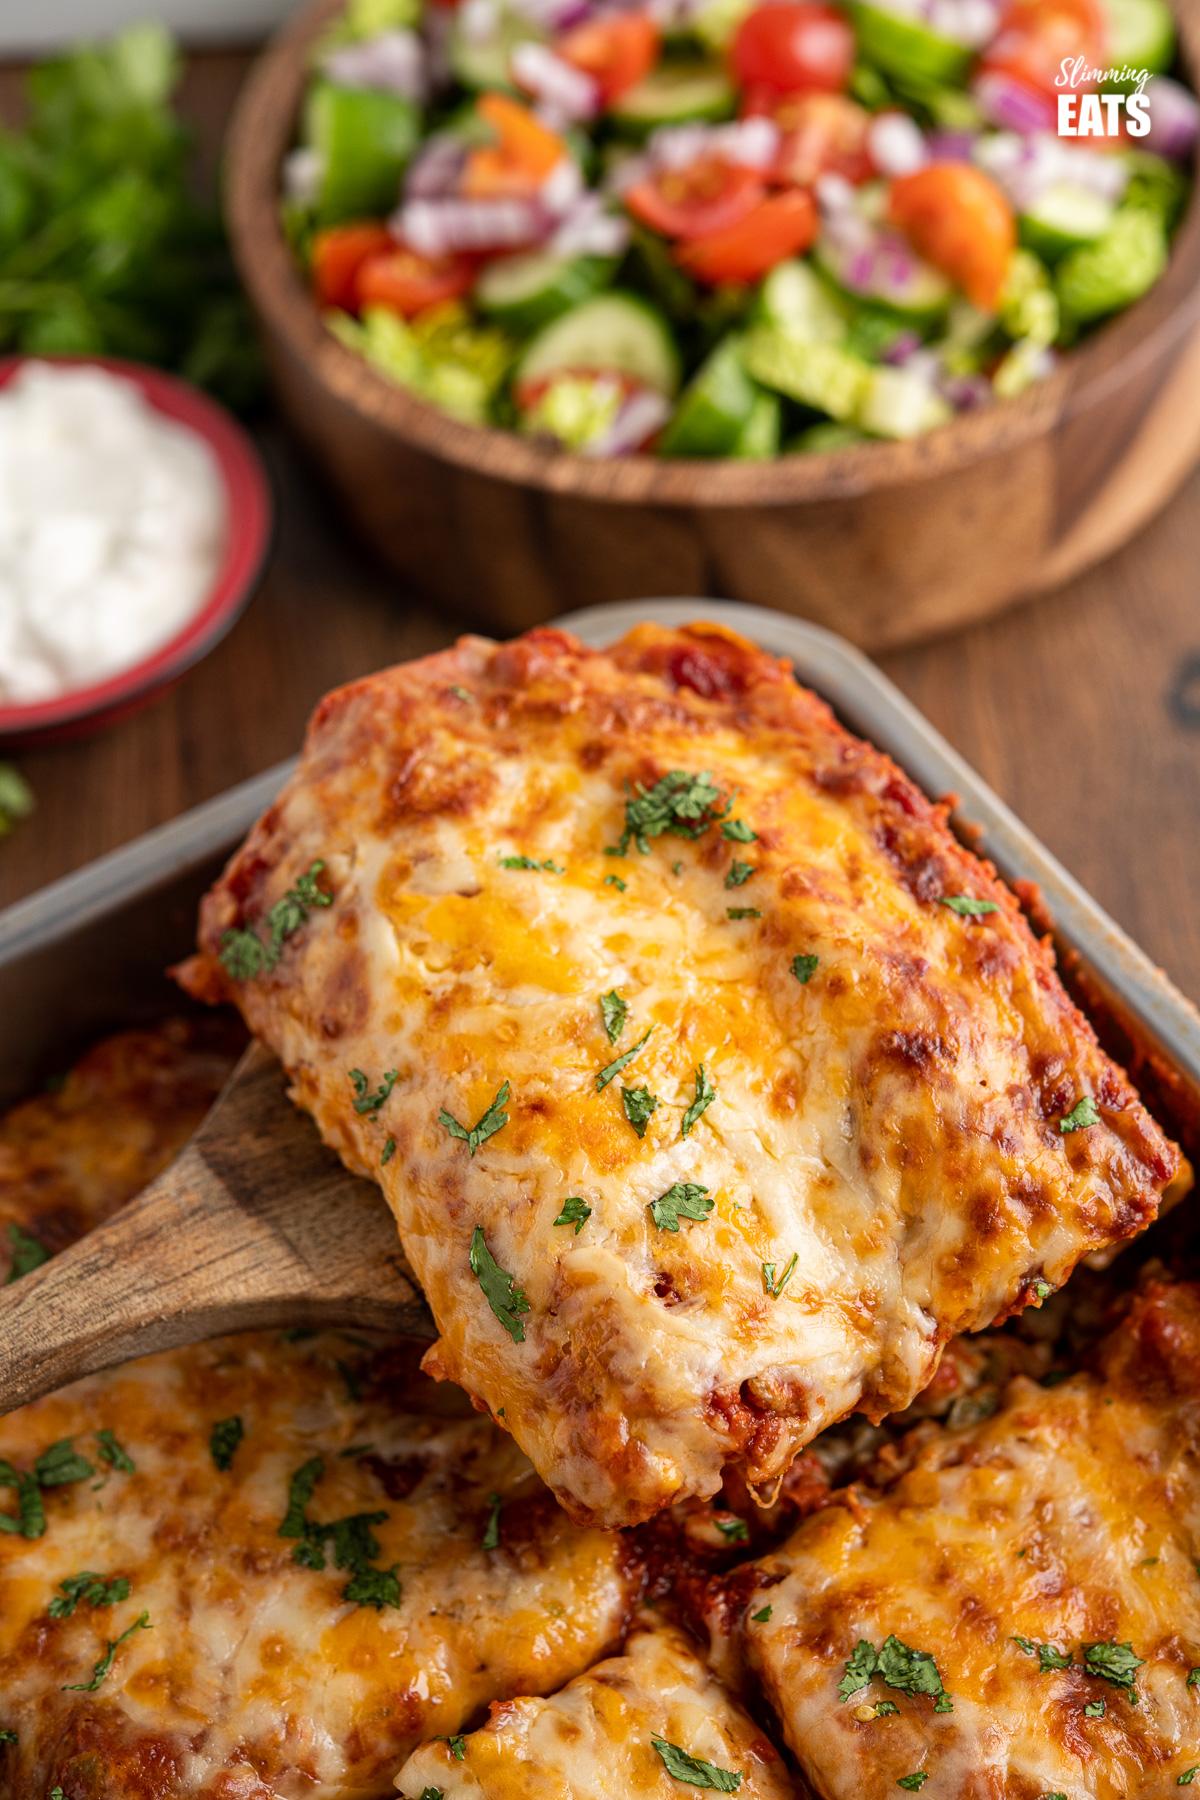 wooden spatula serving up slice of pasta chicken enchiladas from metal baking dish